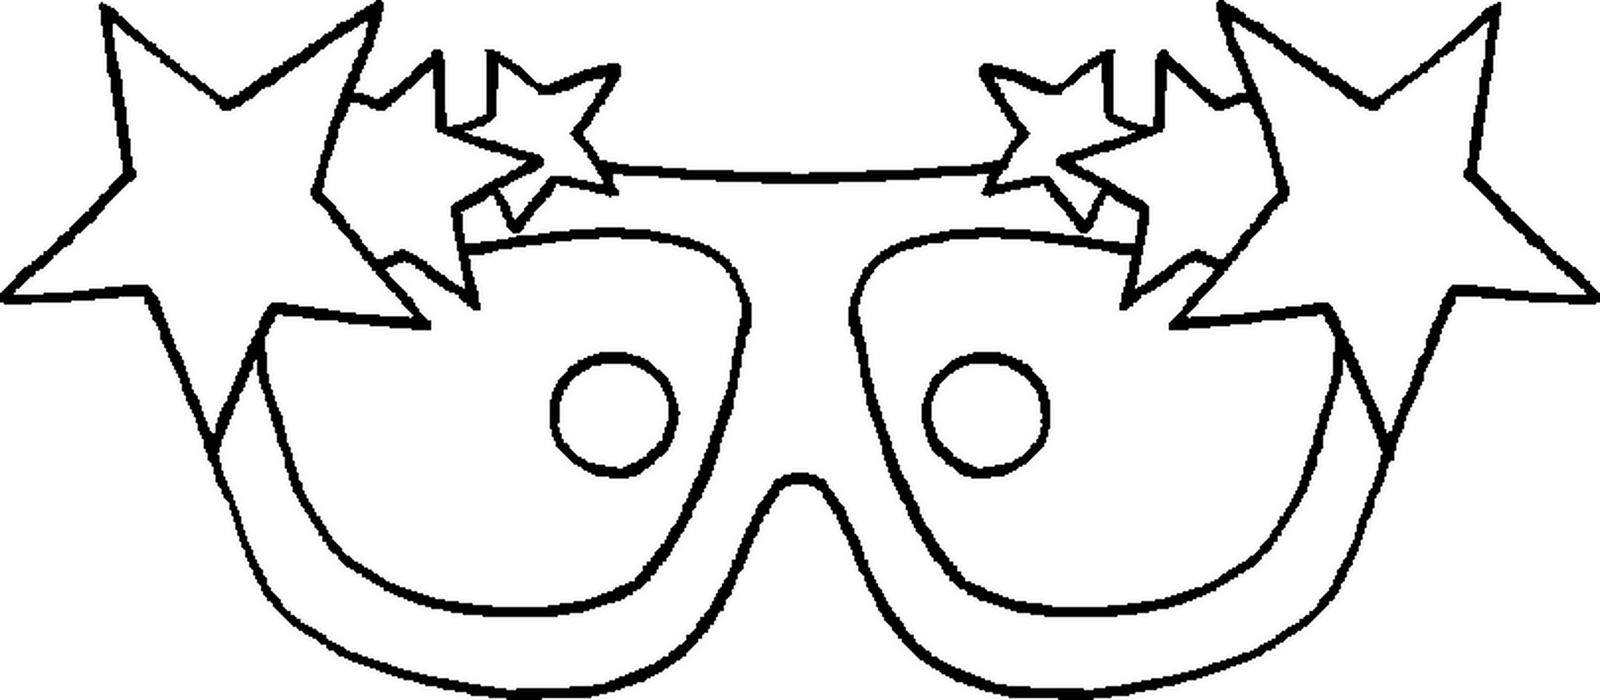 Mascaras de carnaval para imprimir auto design tech - Imagenes de halloween ...